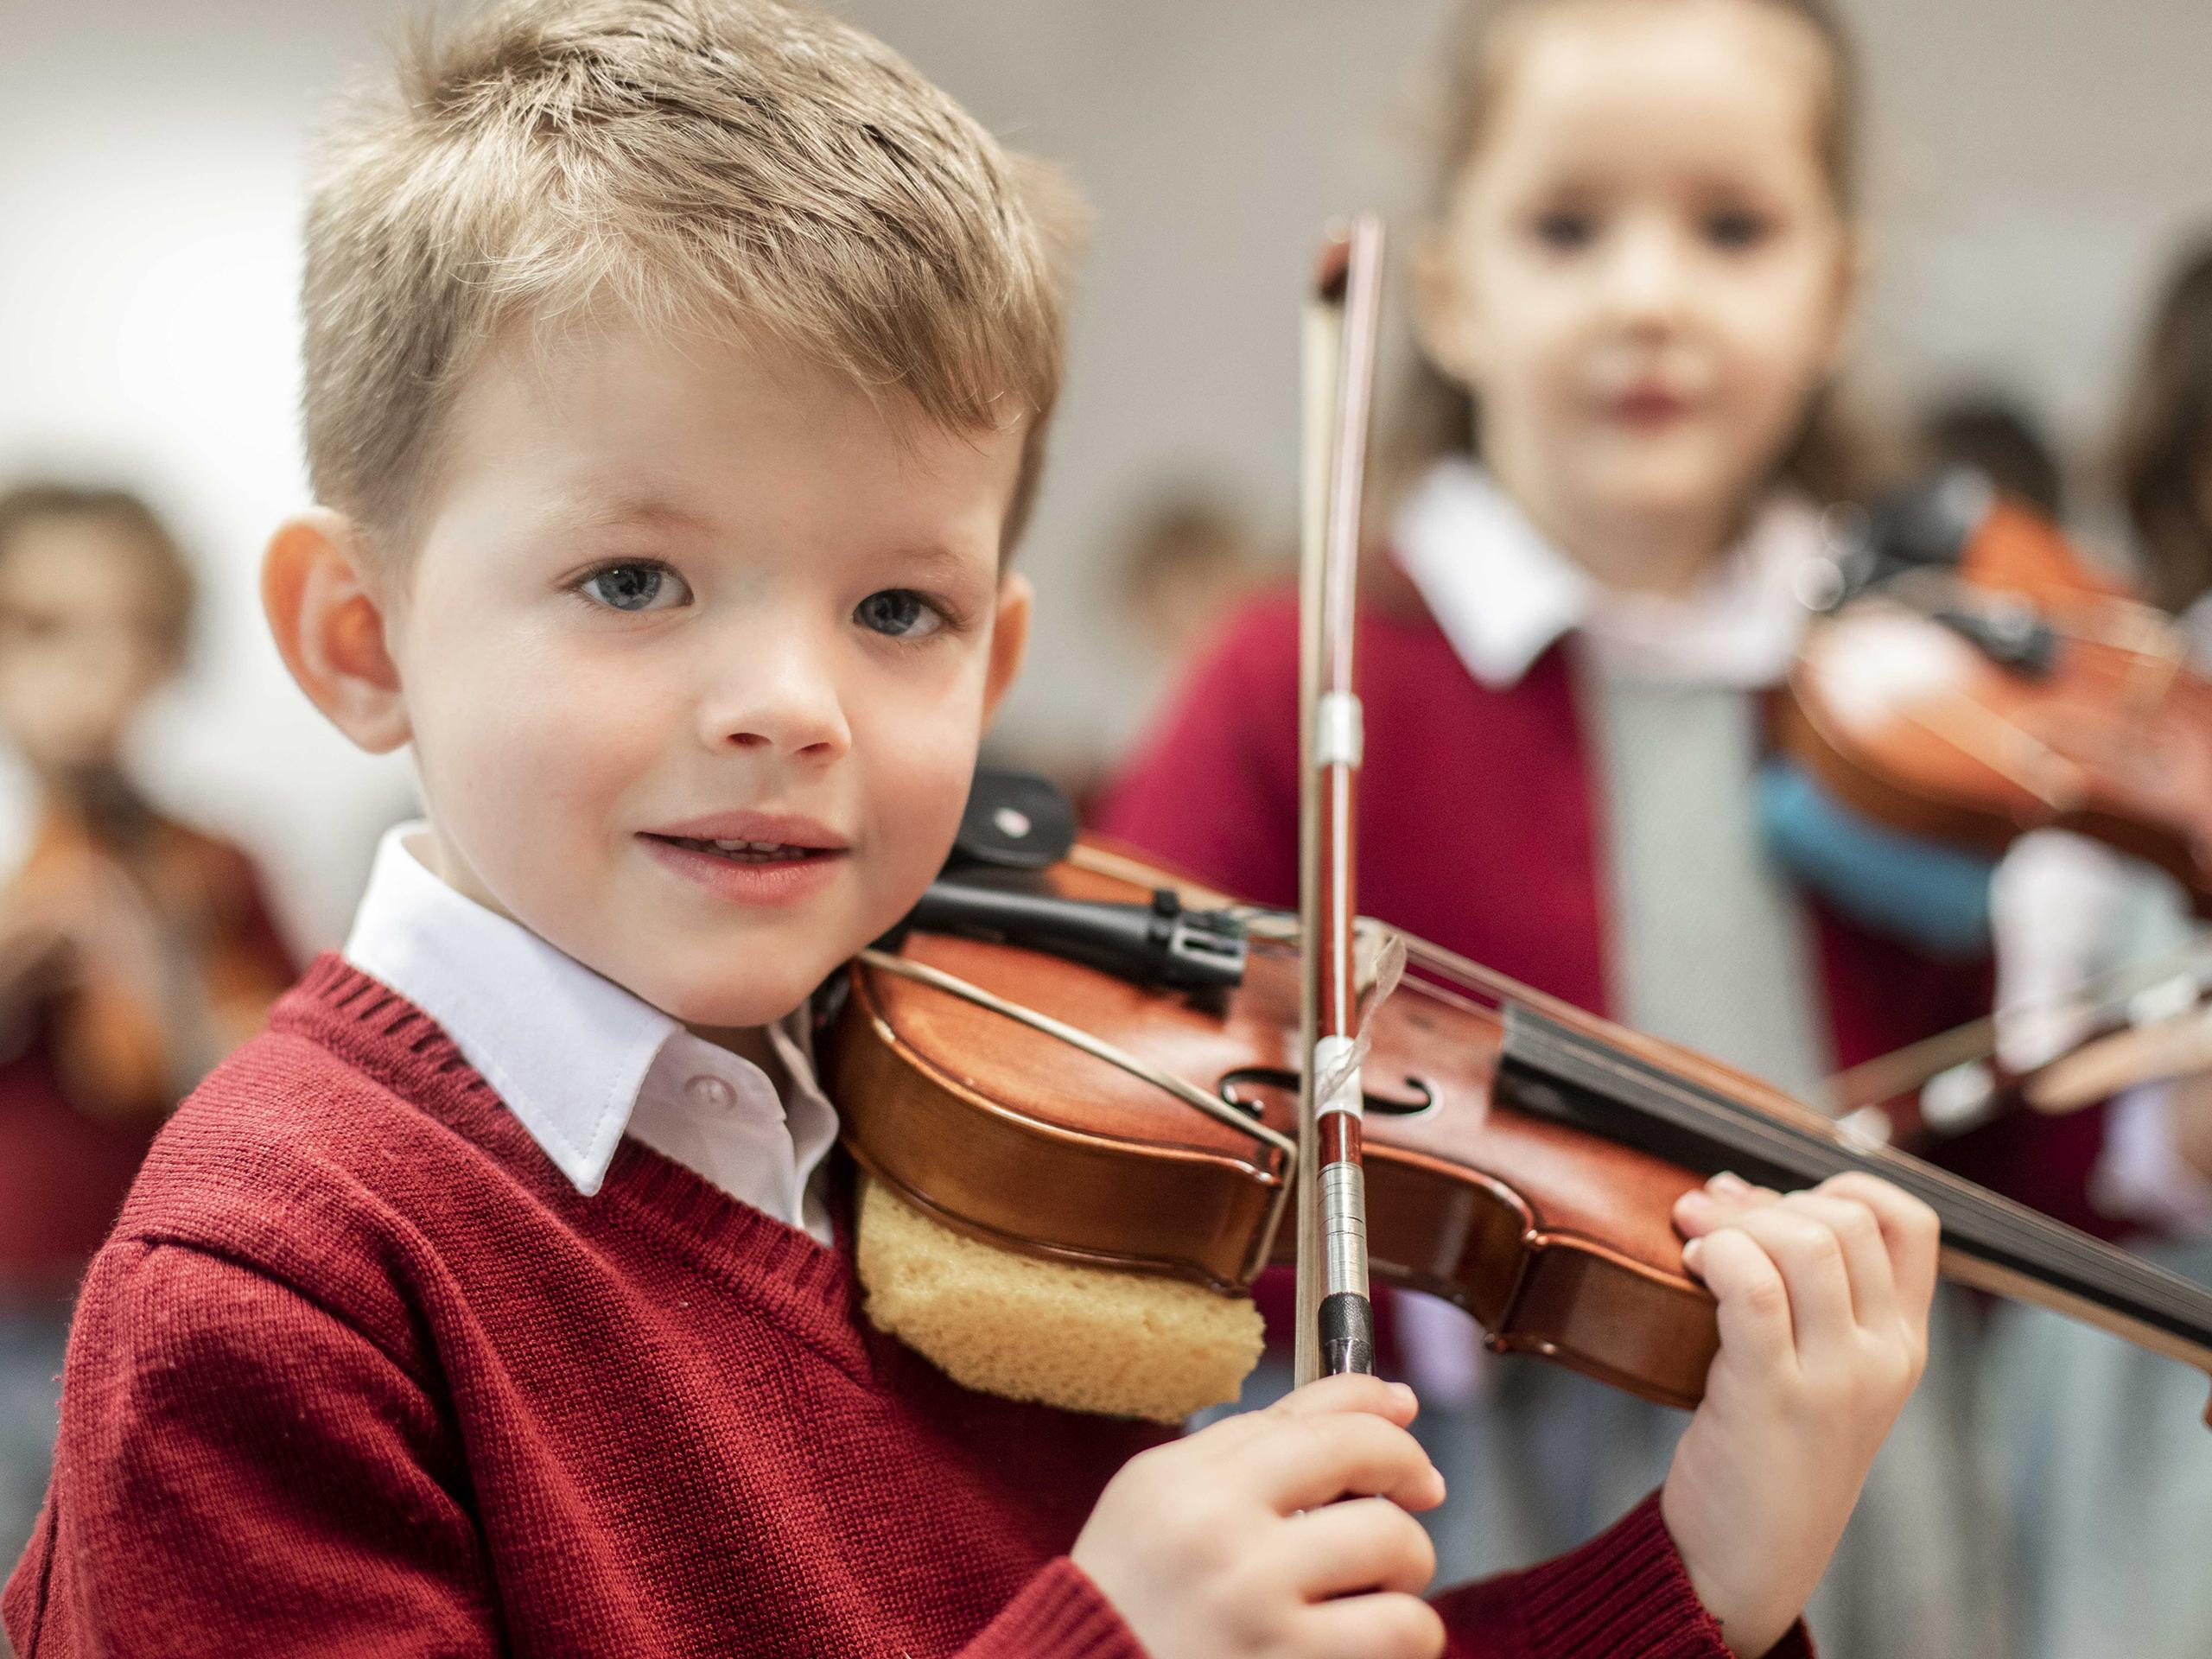 infantil-dallignton-school-9